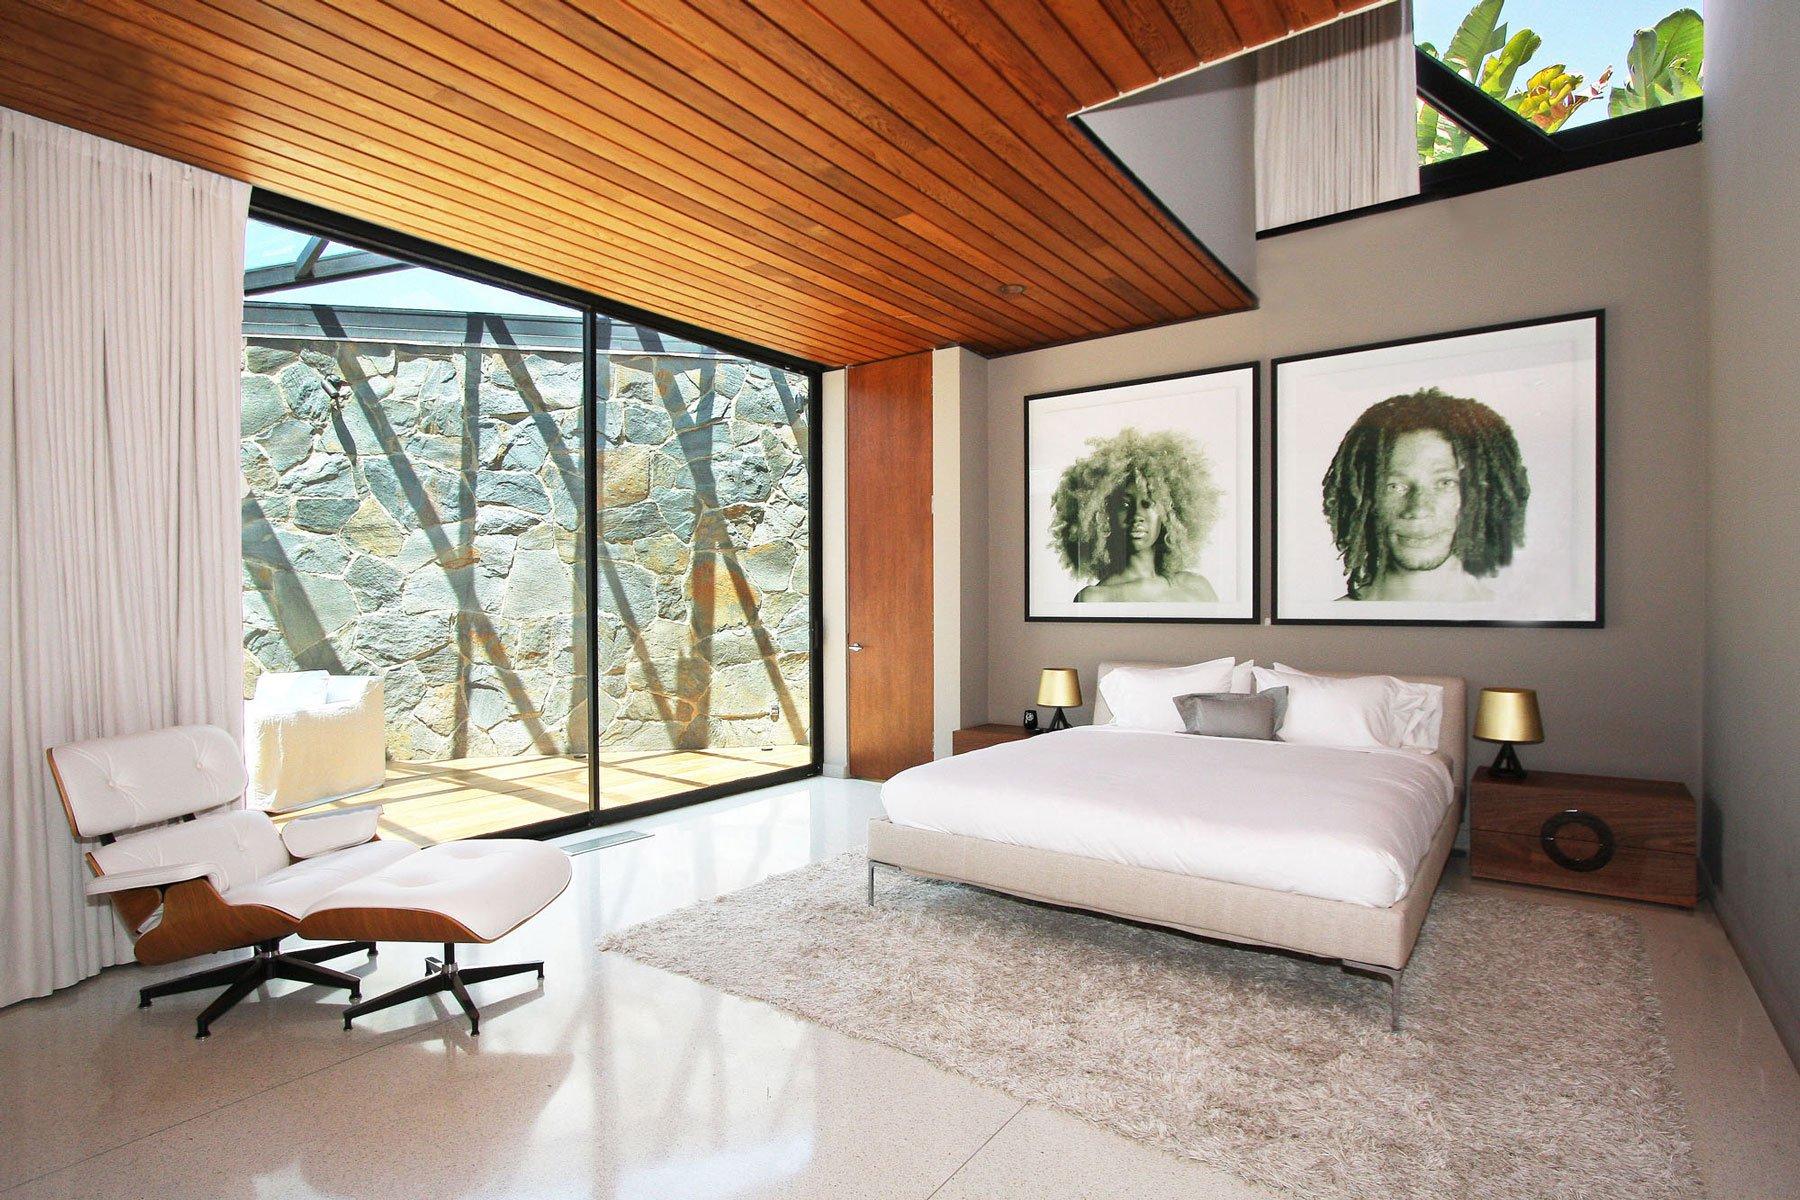 Beverly-Hills-Golden-Age-10